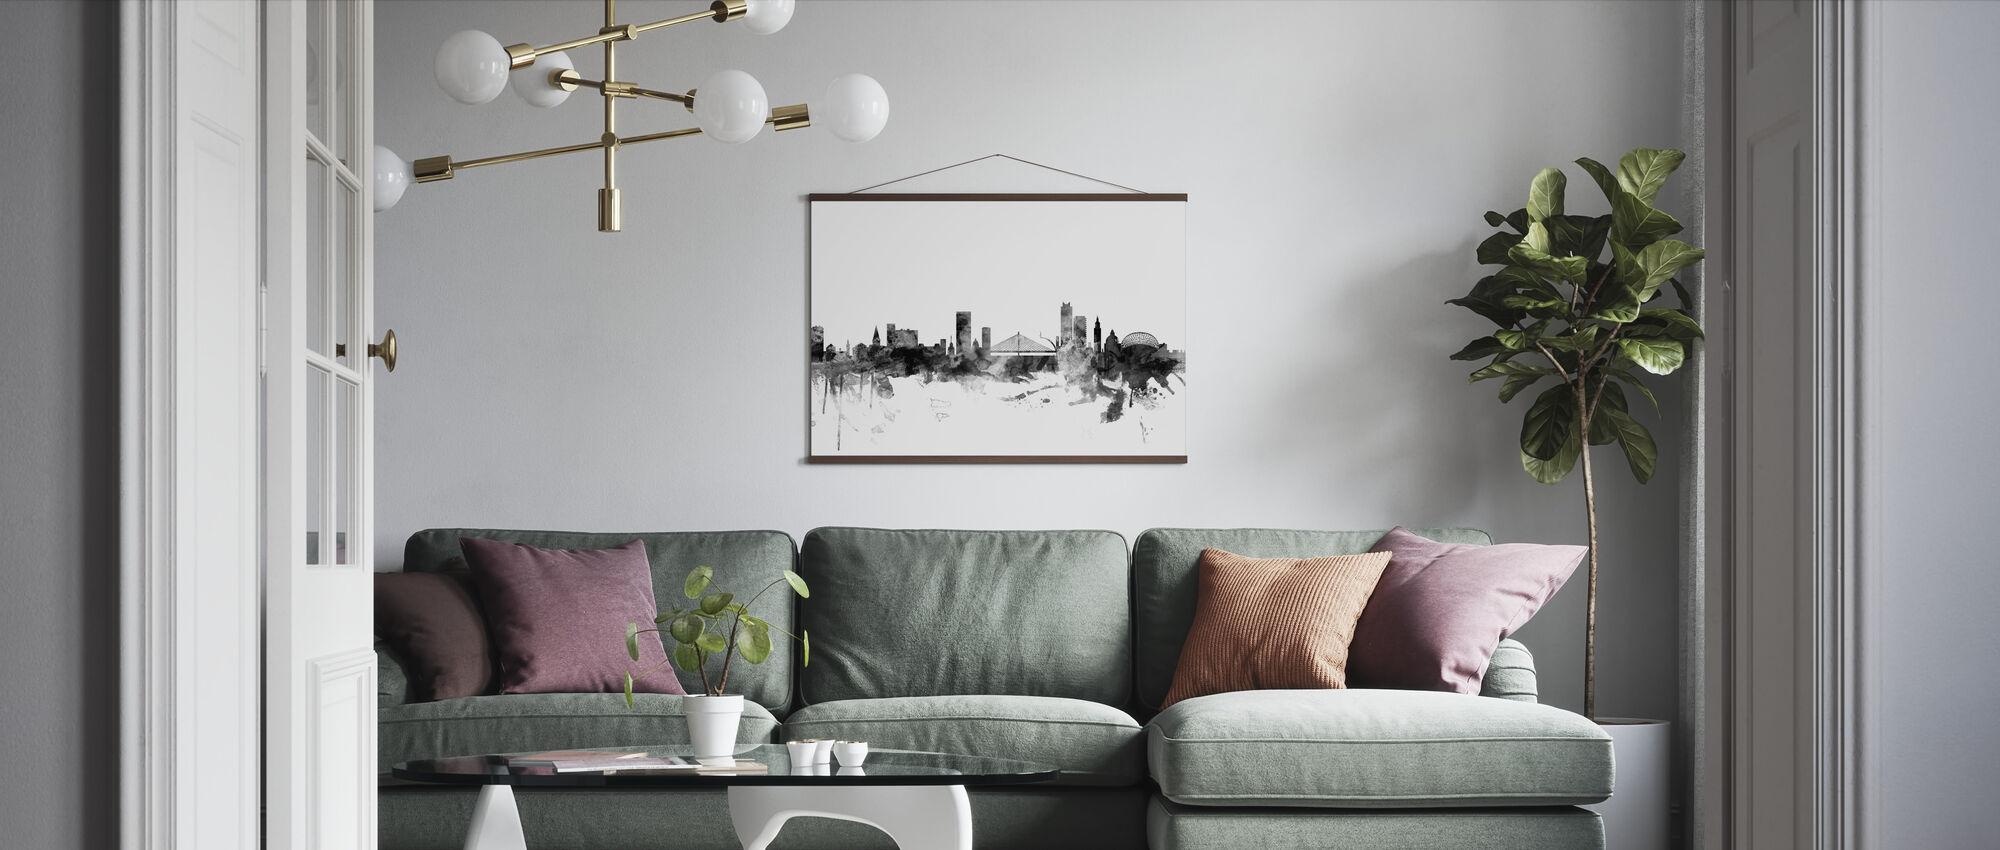 Liege Belgium Skyline Black - Poster - Living Room